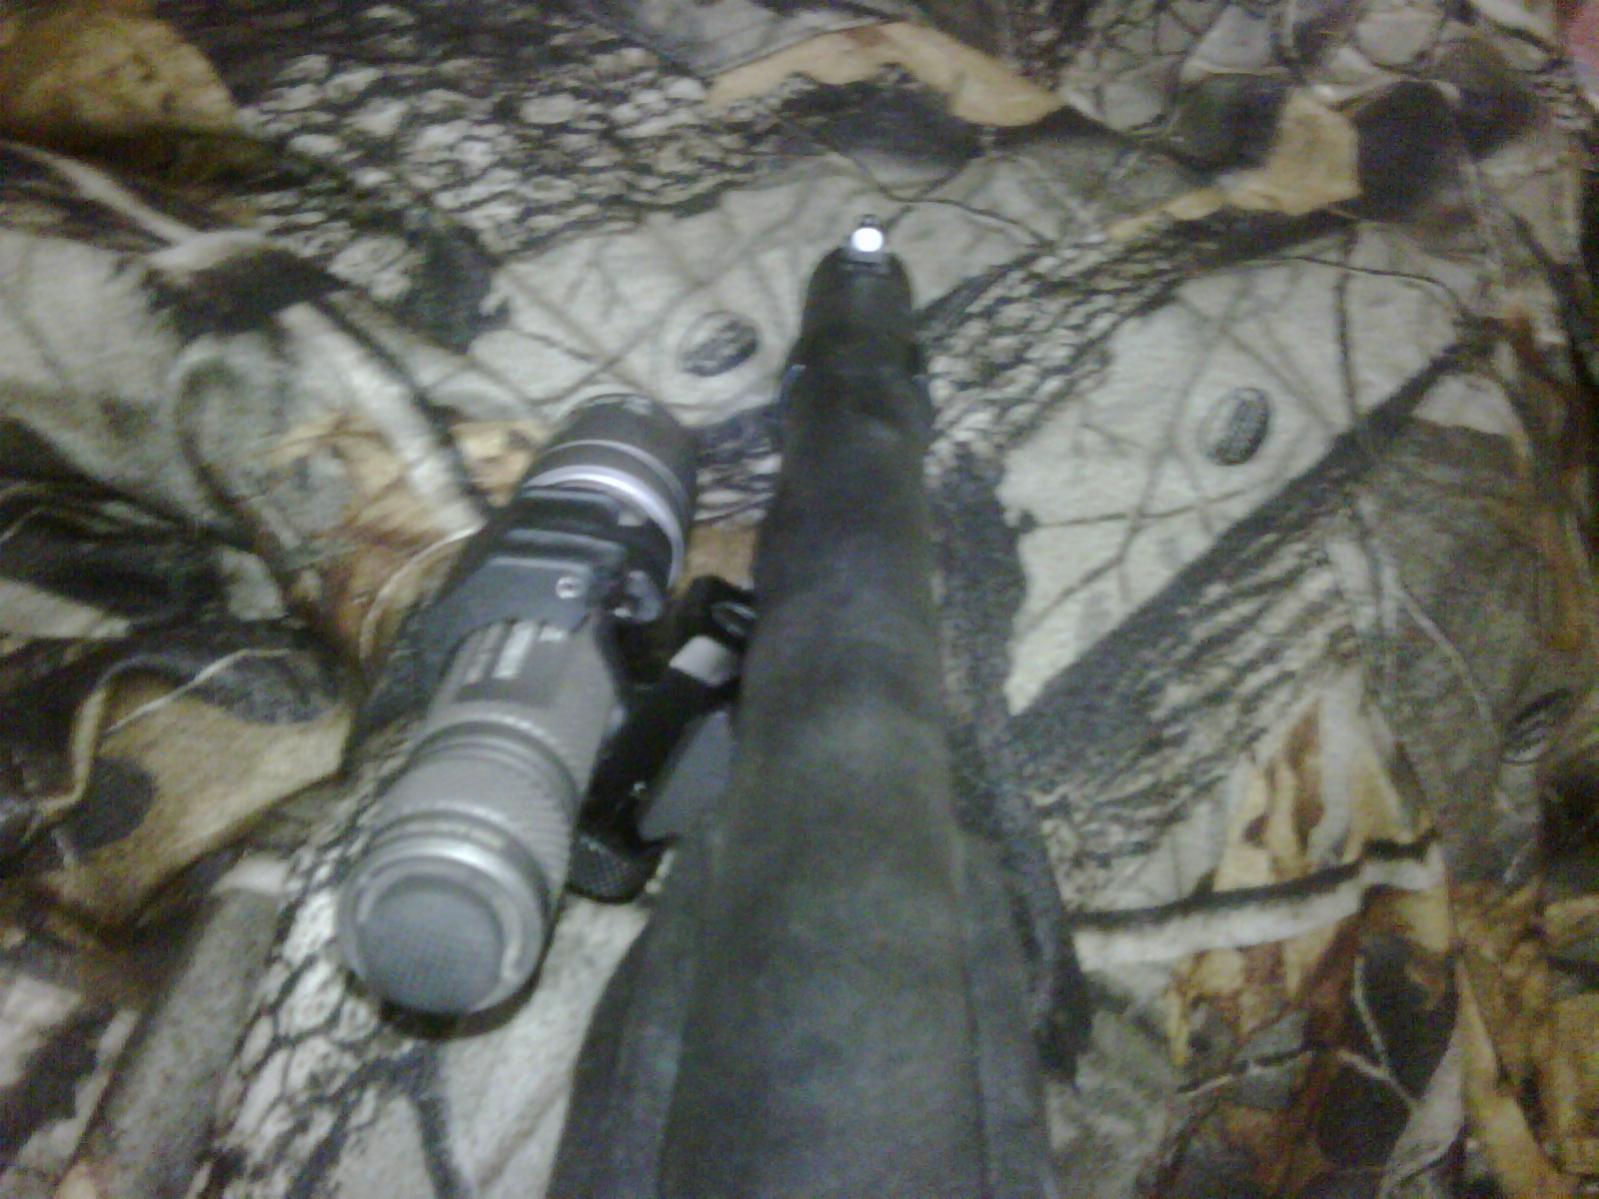 Finally Finished my 870 HD Shotgun!!!!!!!-870-big-dot-light.jpg